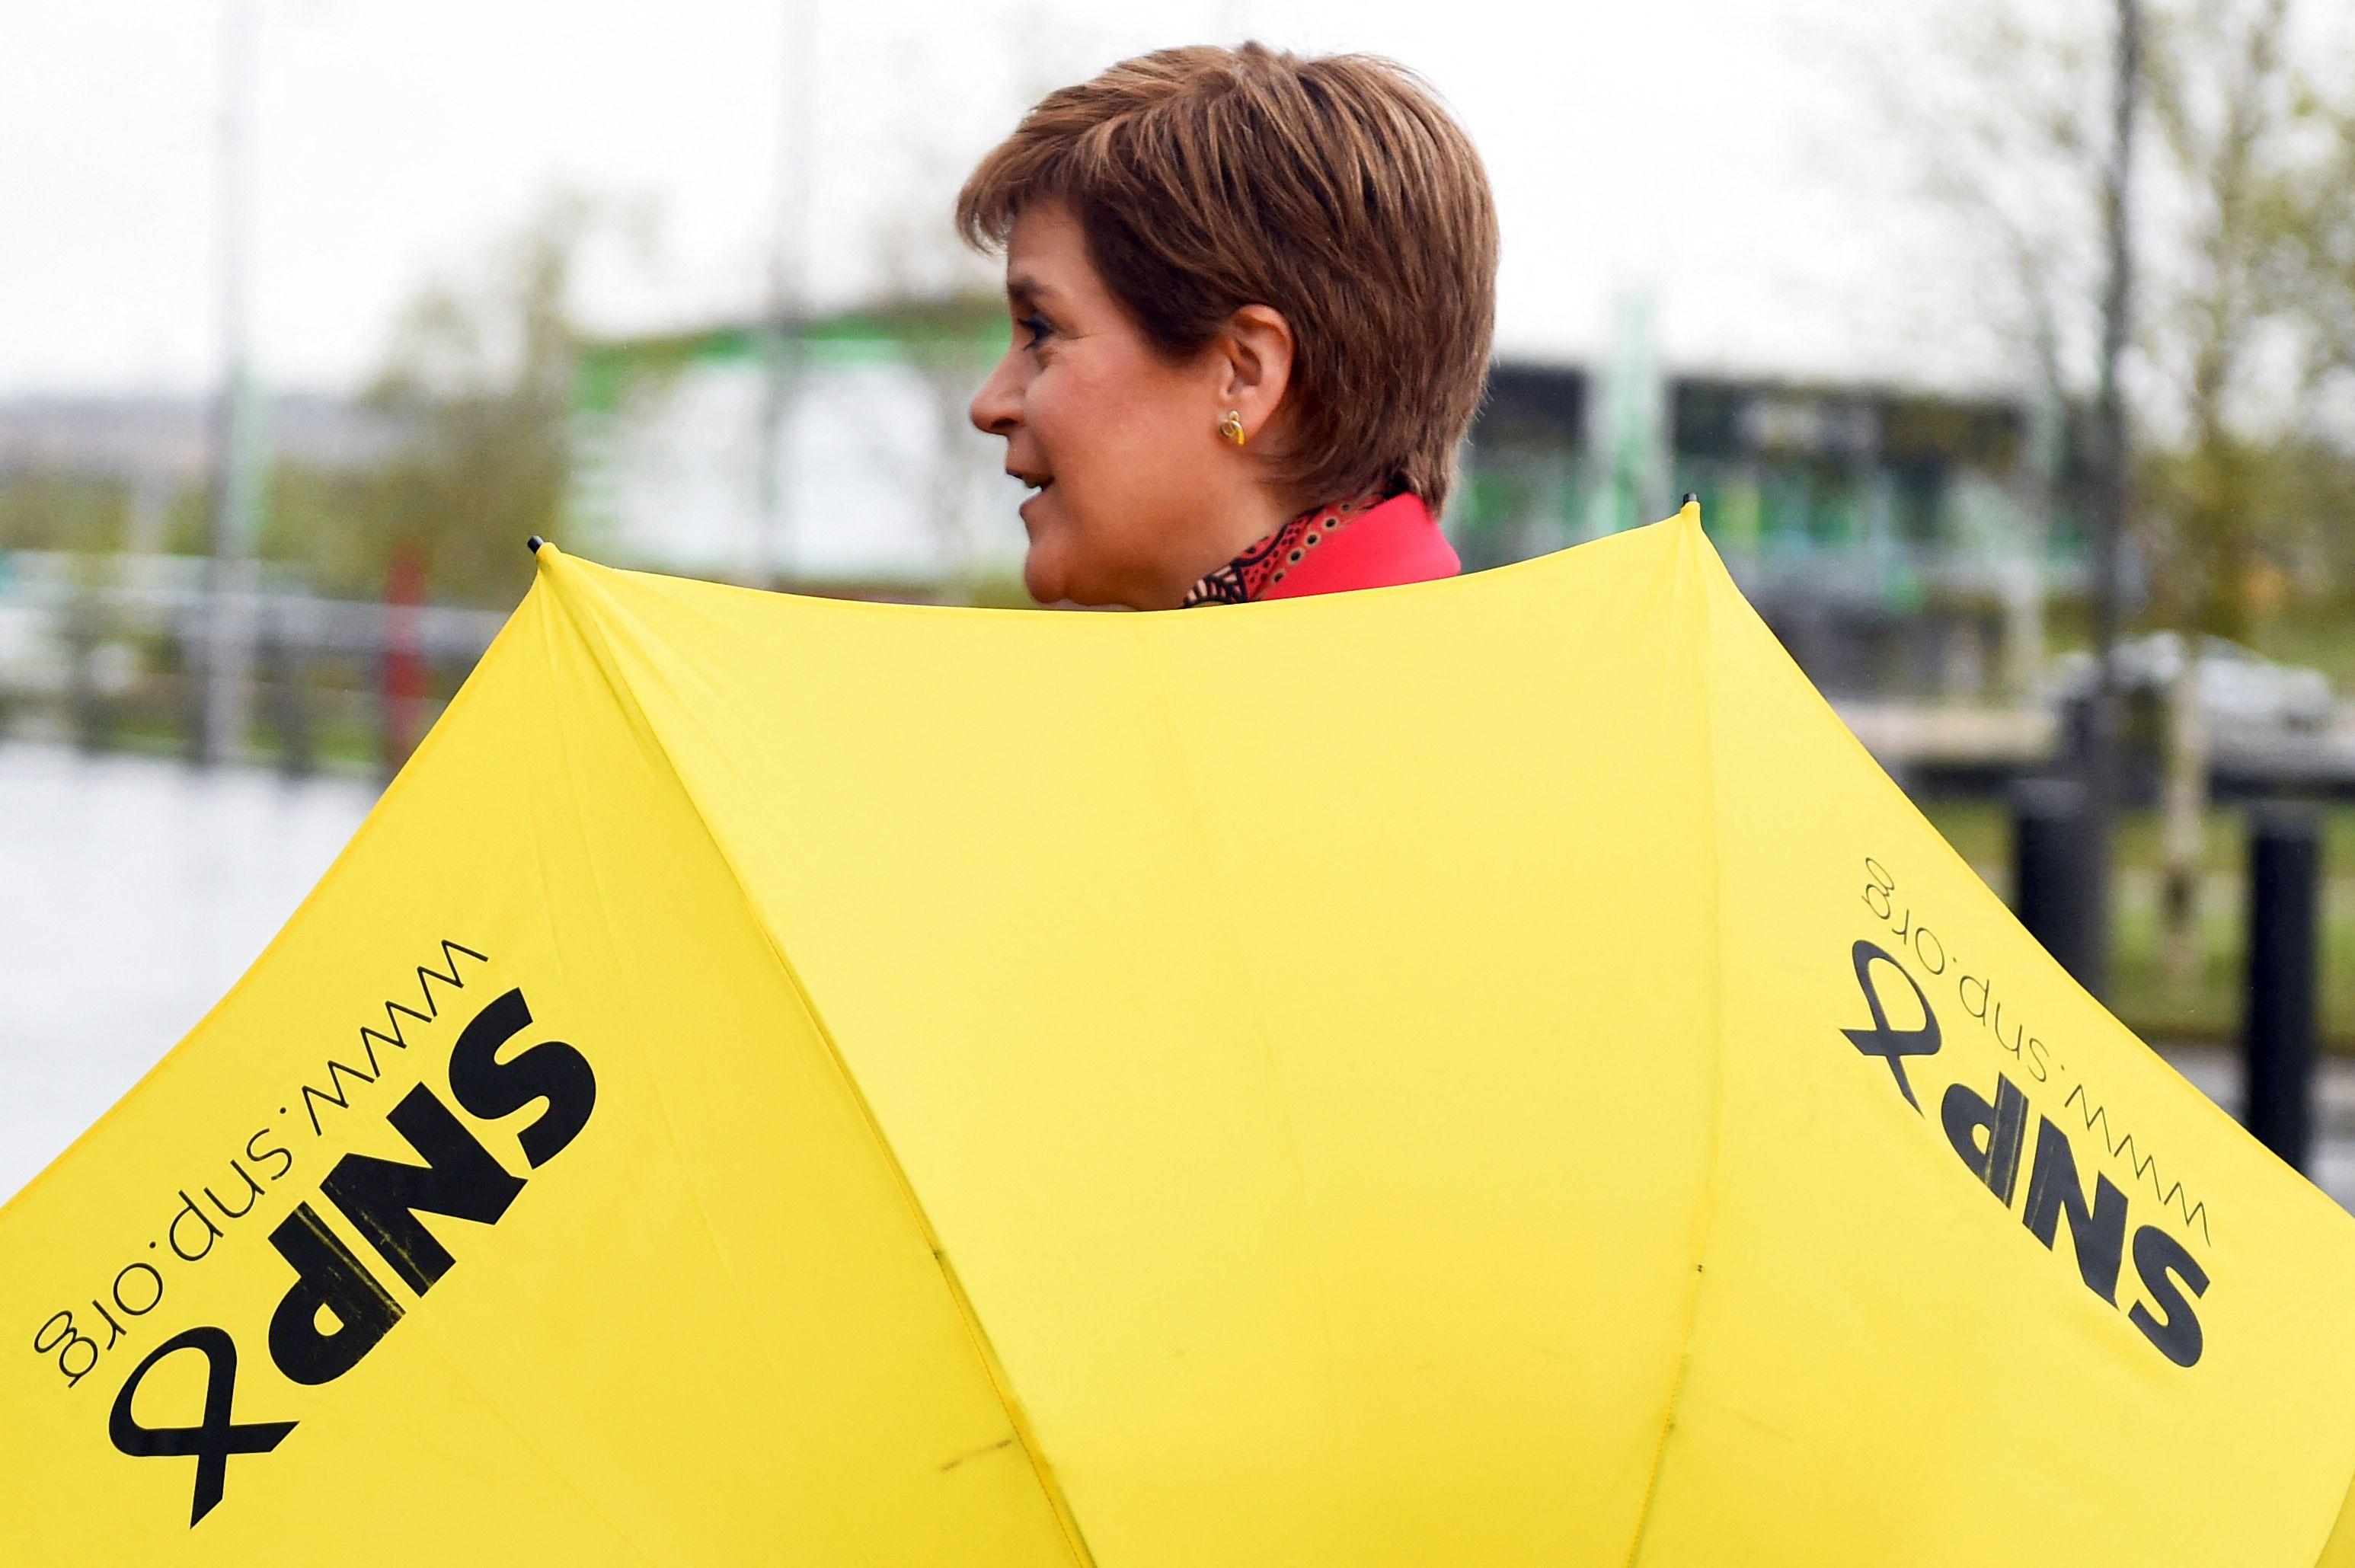 La líder del SNP, Nicola Sturgeon.